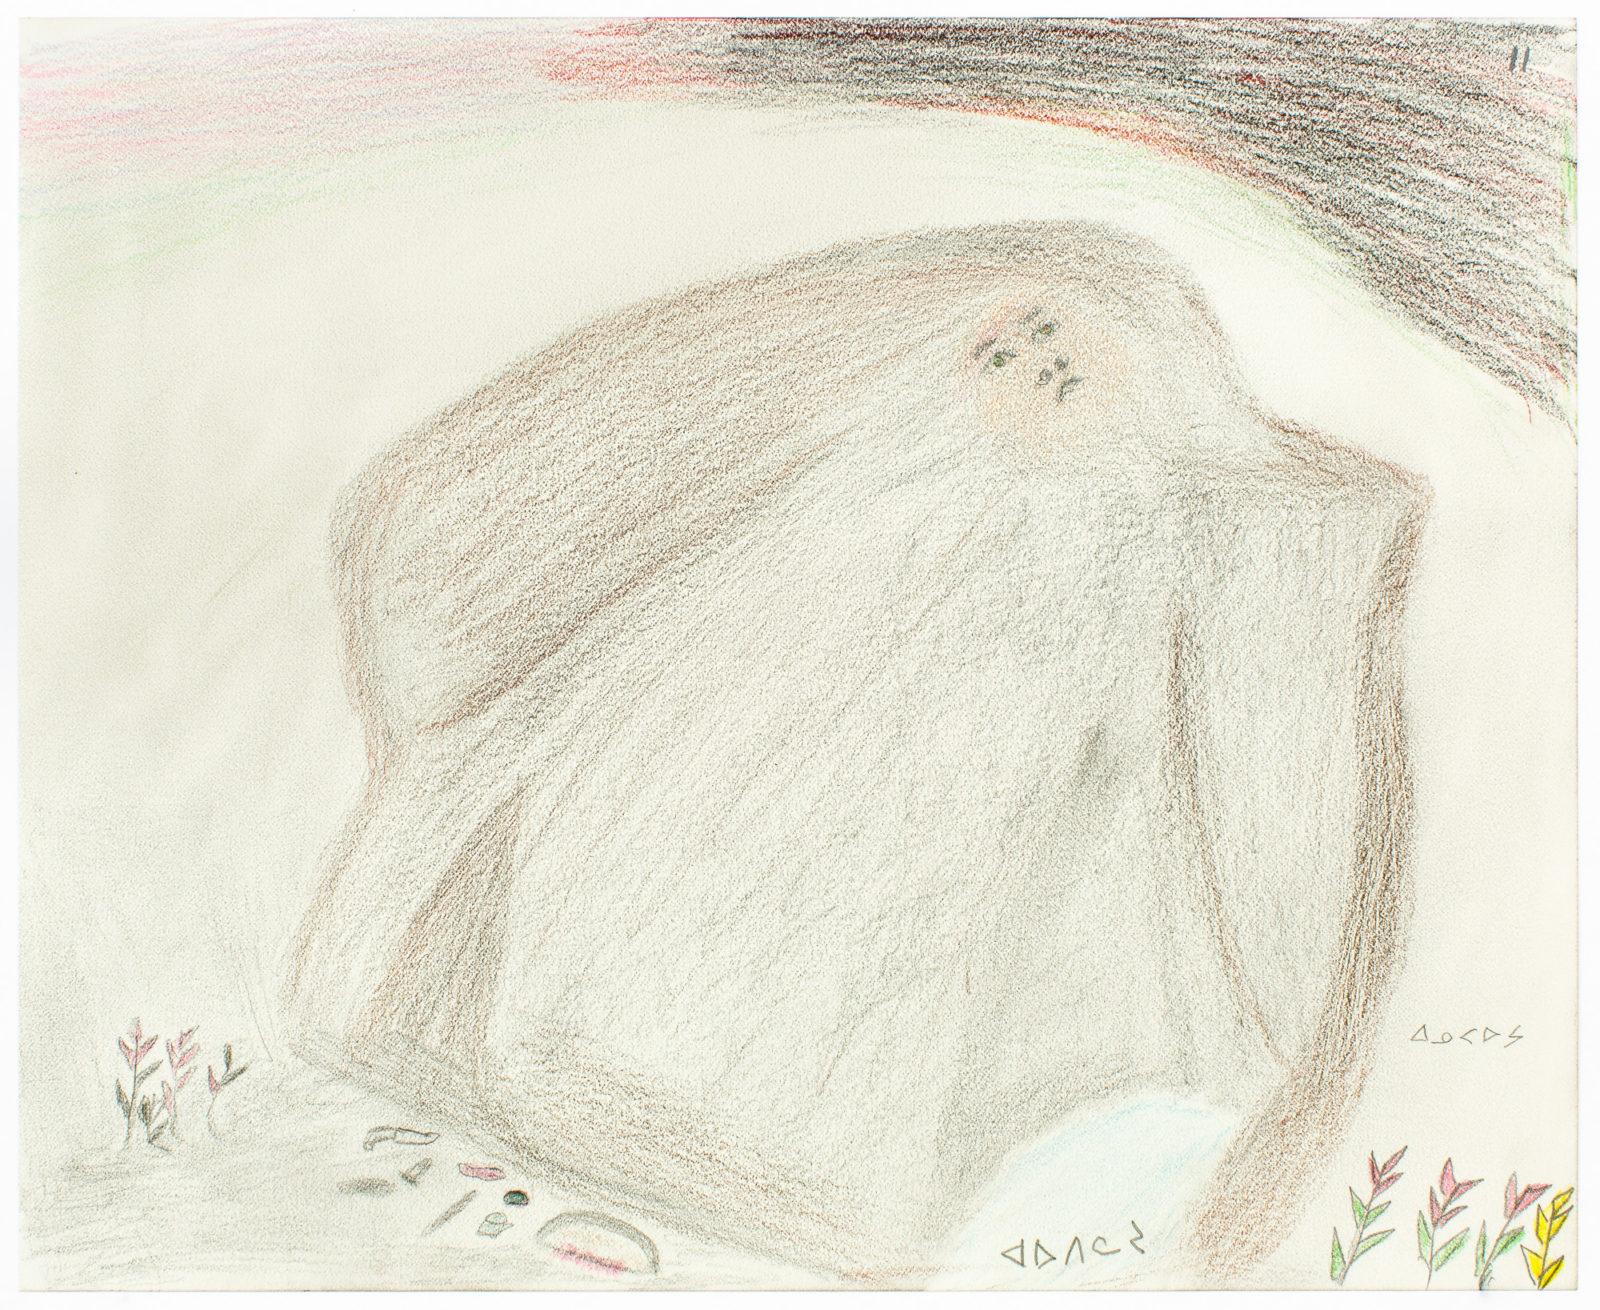 Mariano Aupilardjuk - untitled (woman who turned into a boulder)